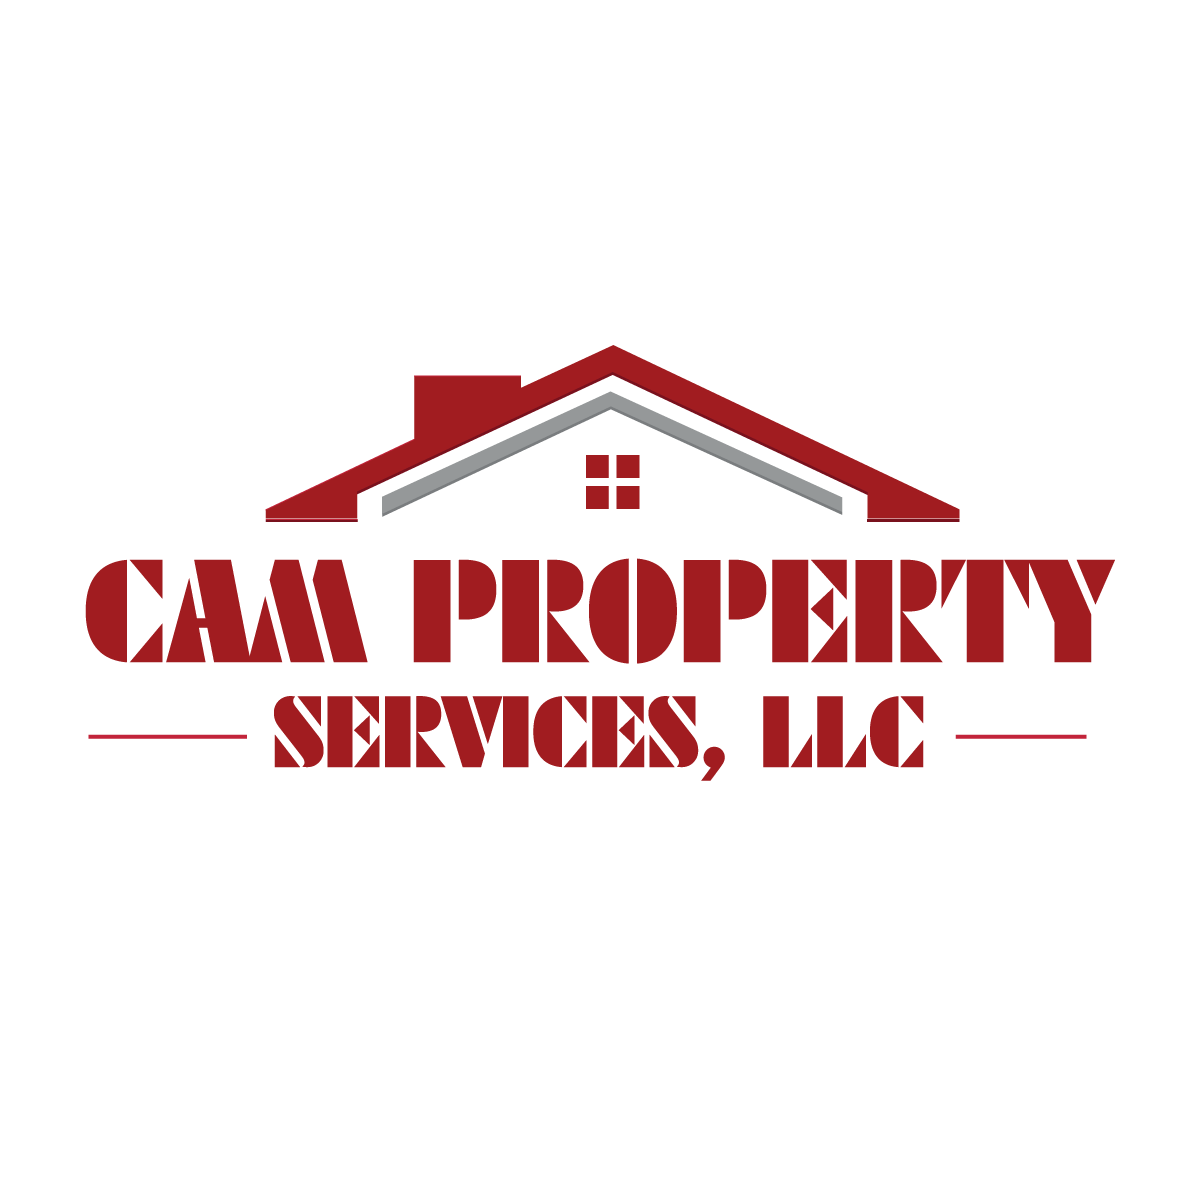 CaM Property Services, LLC logo